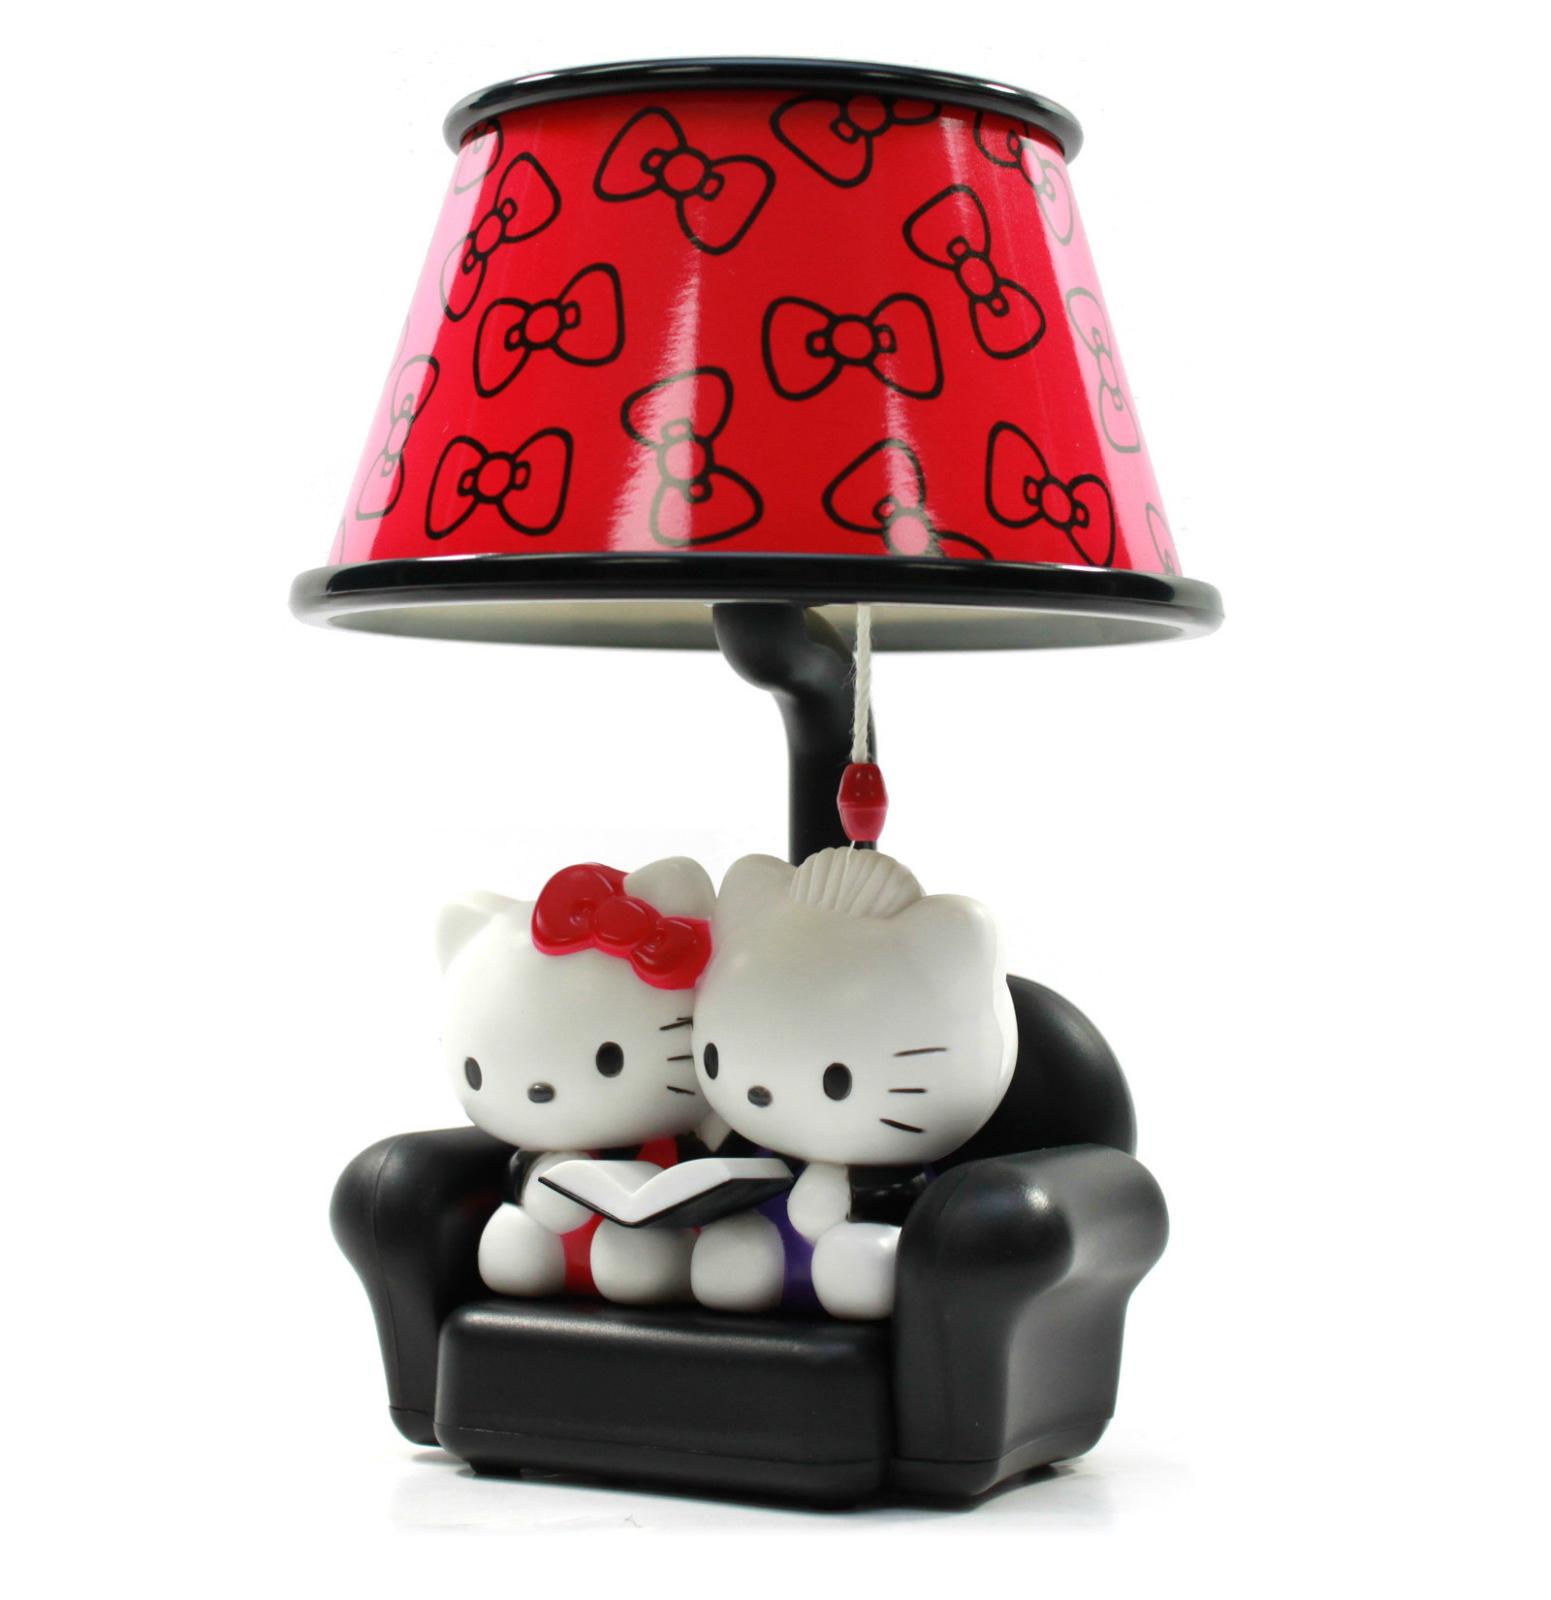 new hello kitty red ribbon pattern sofa shape toy lamp 7 eikoh japan import ebay. Black Bedroom Furniture Sets. Home Design Ideas